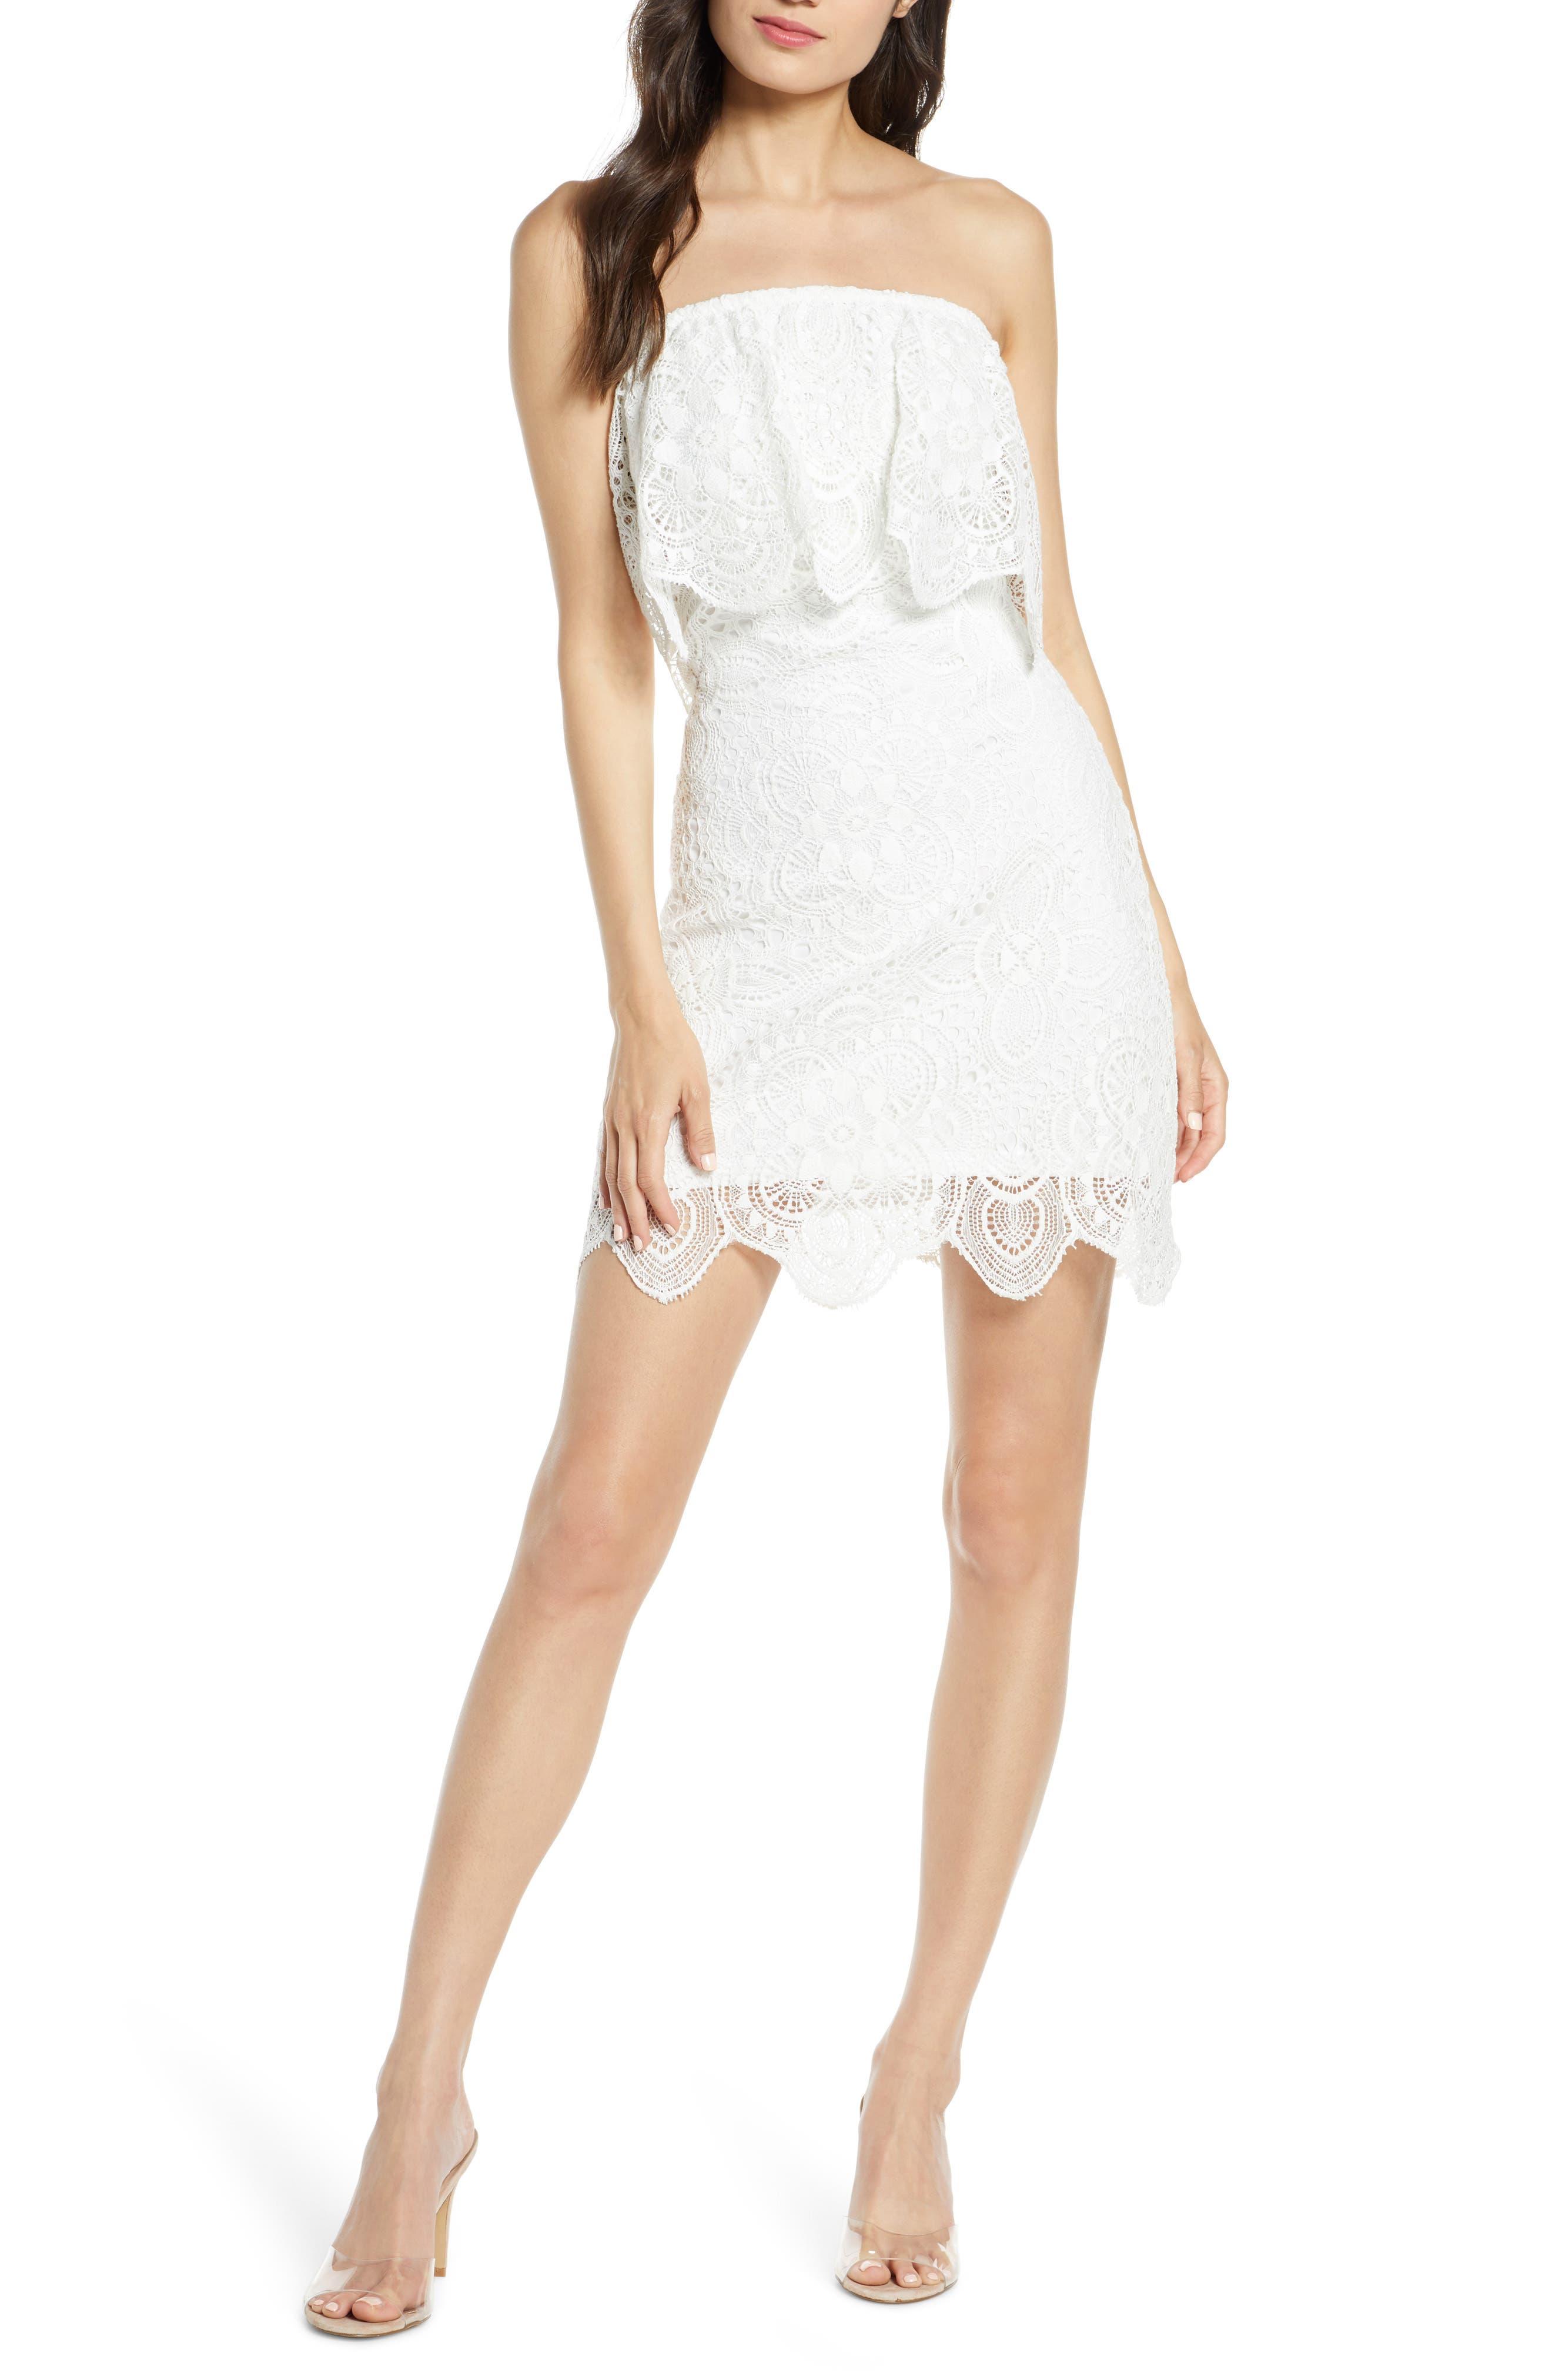 Aquamarine Strapless Mini Dress